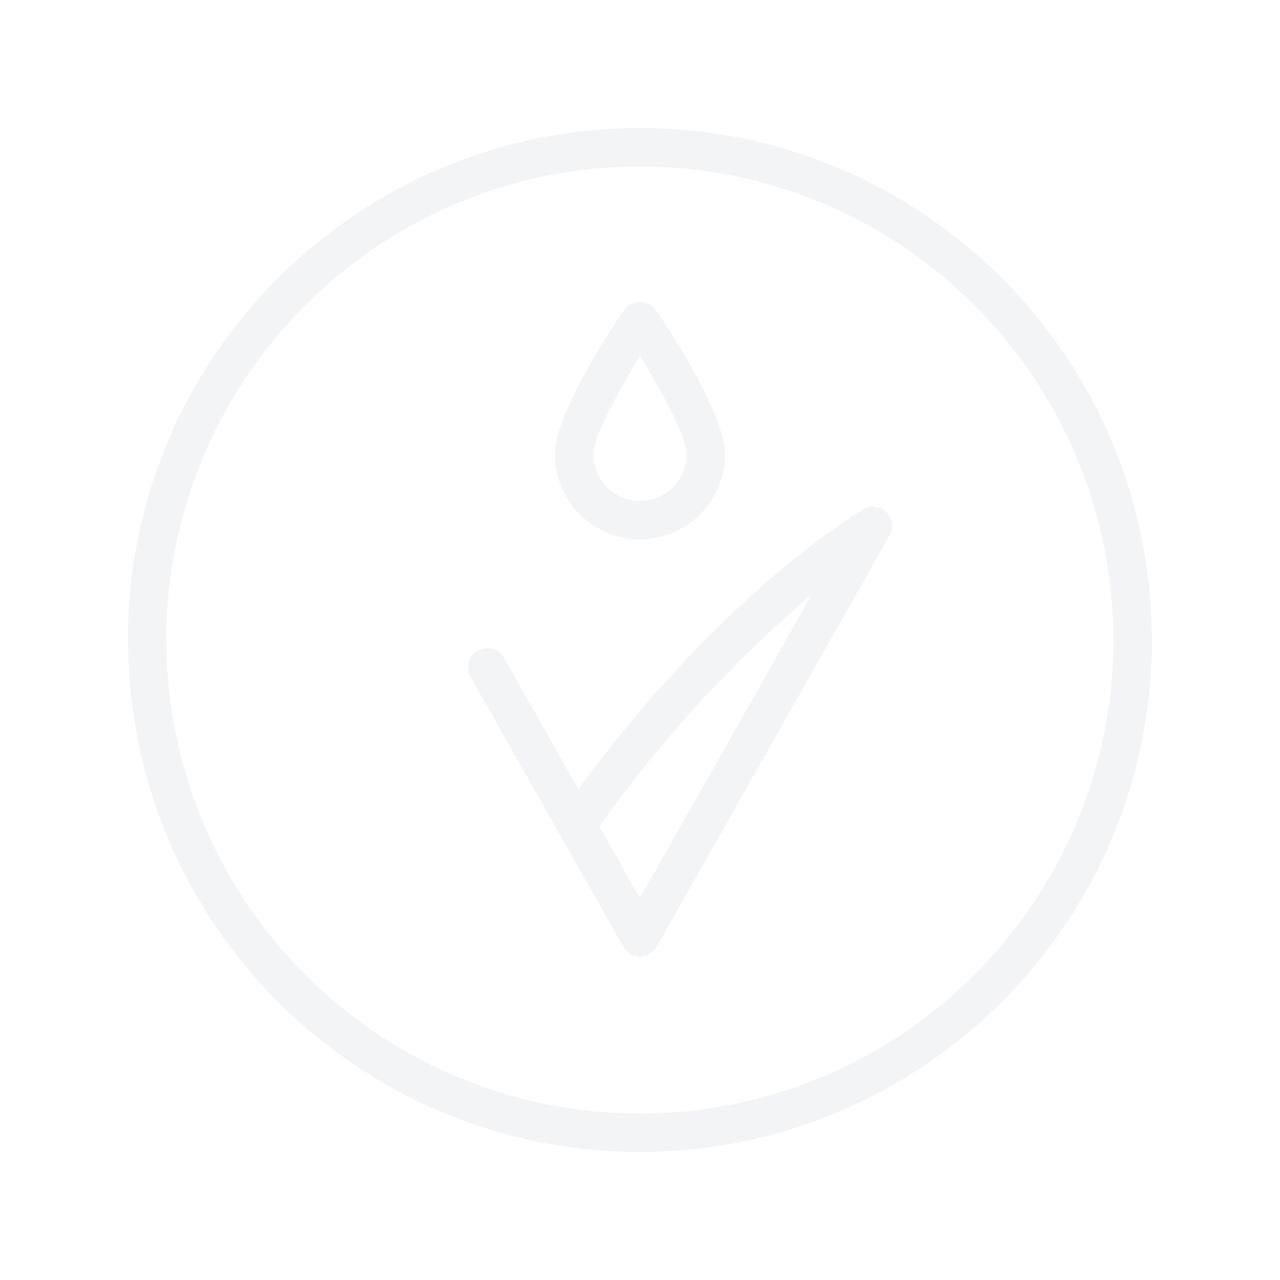 MISSHA Super Aqua Cell Renew Snail Sheet Mask 25ml